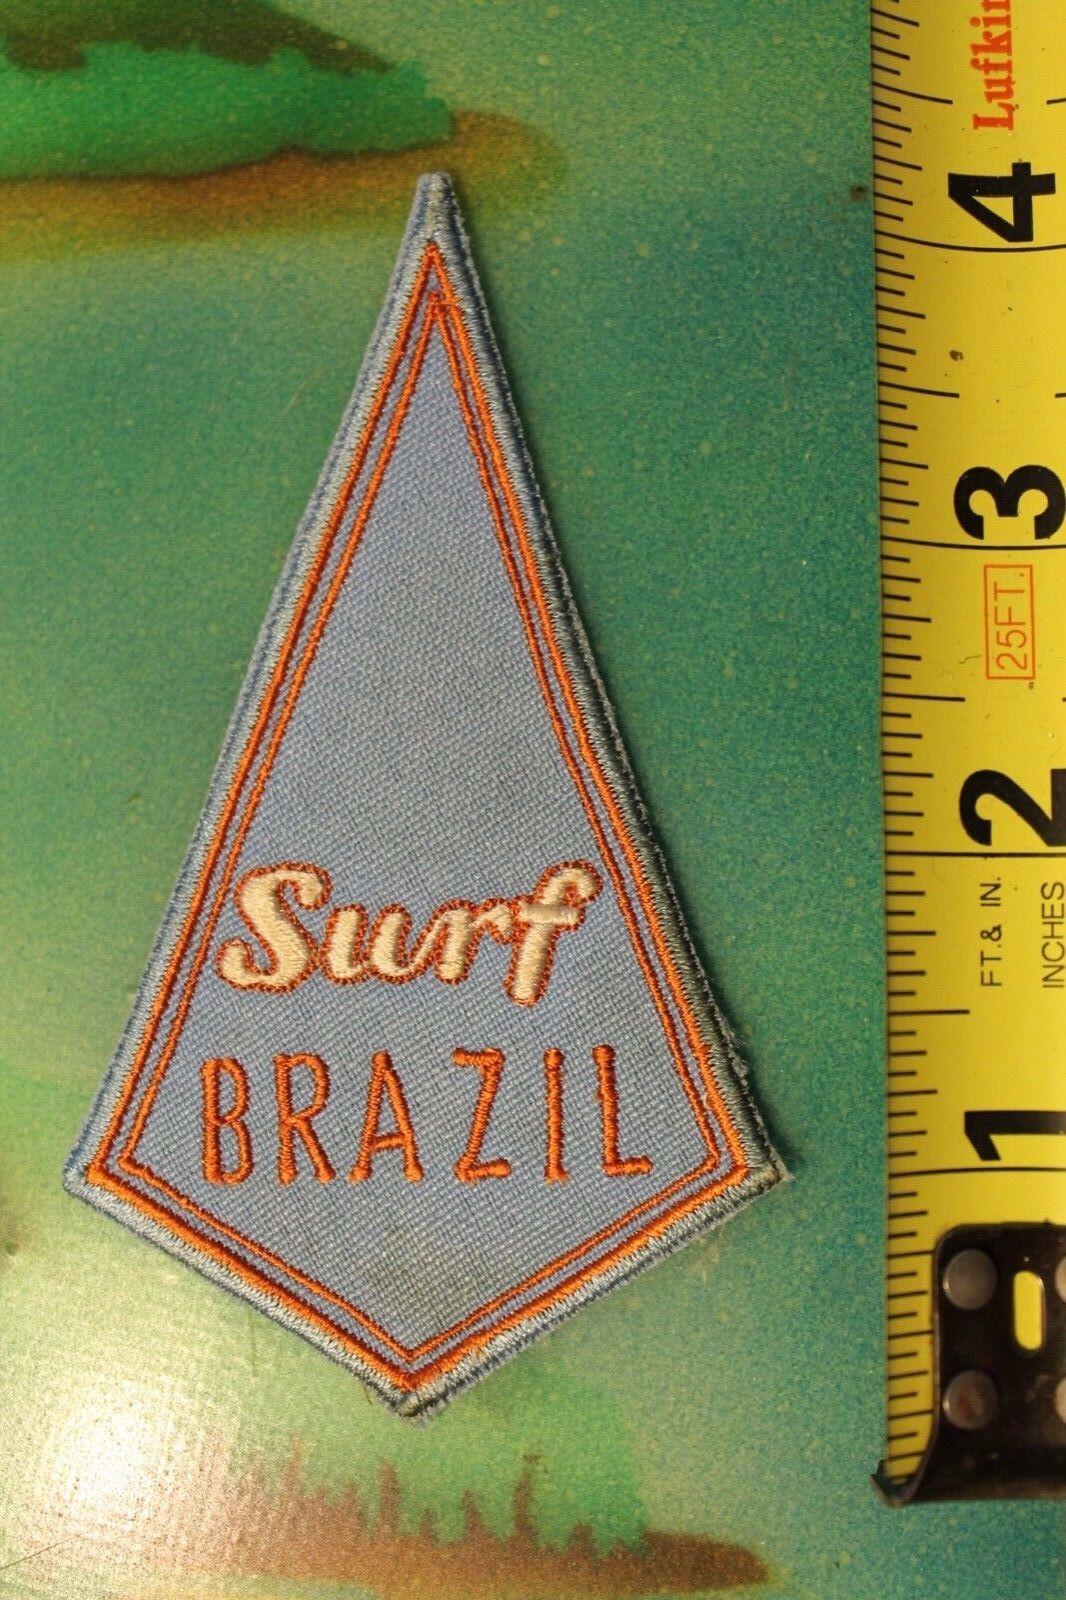 SURF BRAZIL South America Surf Surfboards Original Vintage 60's Surfing PATCH